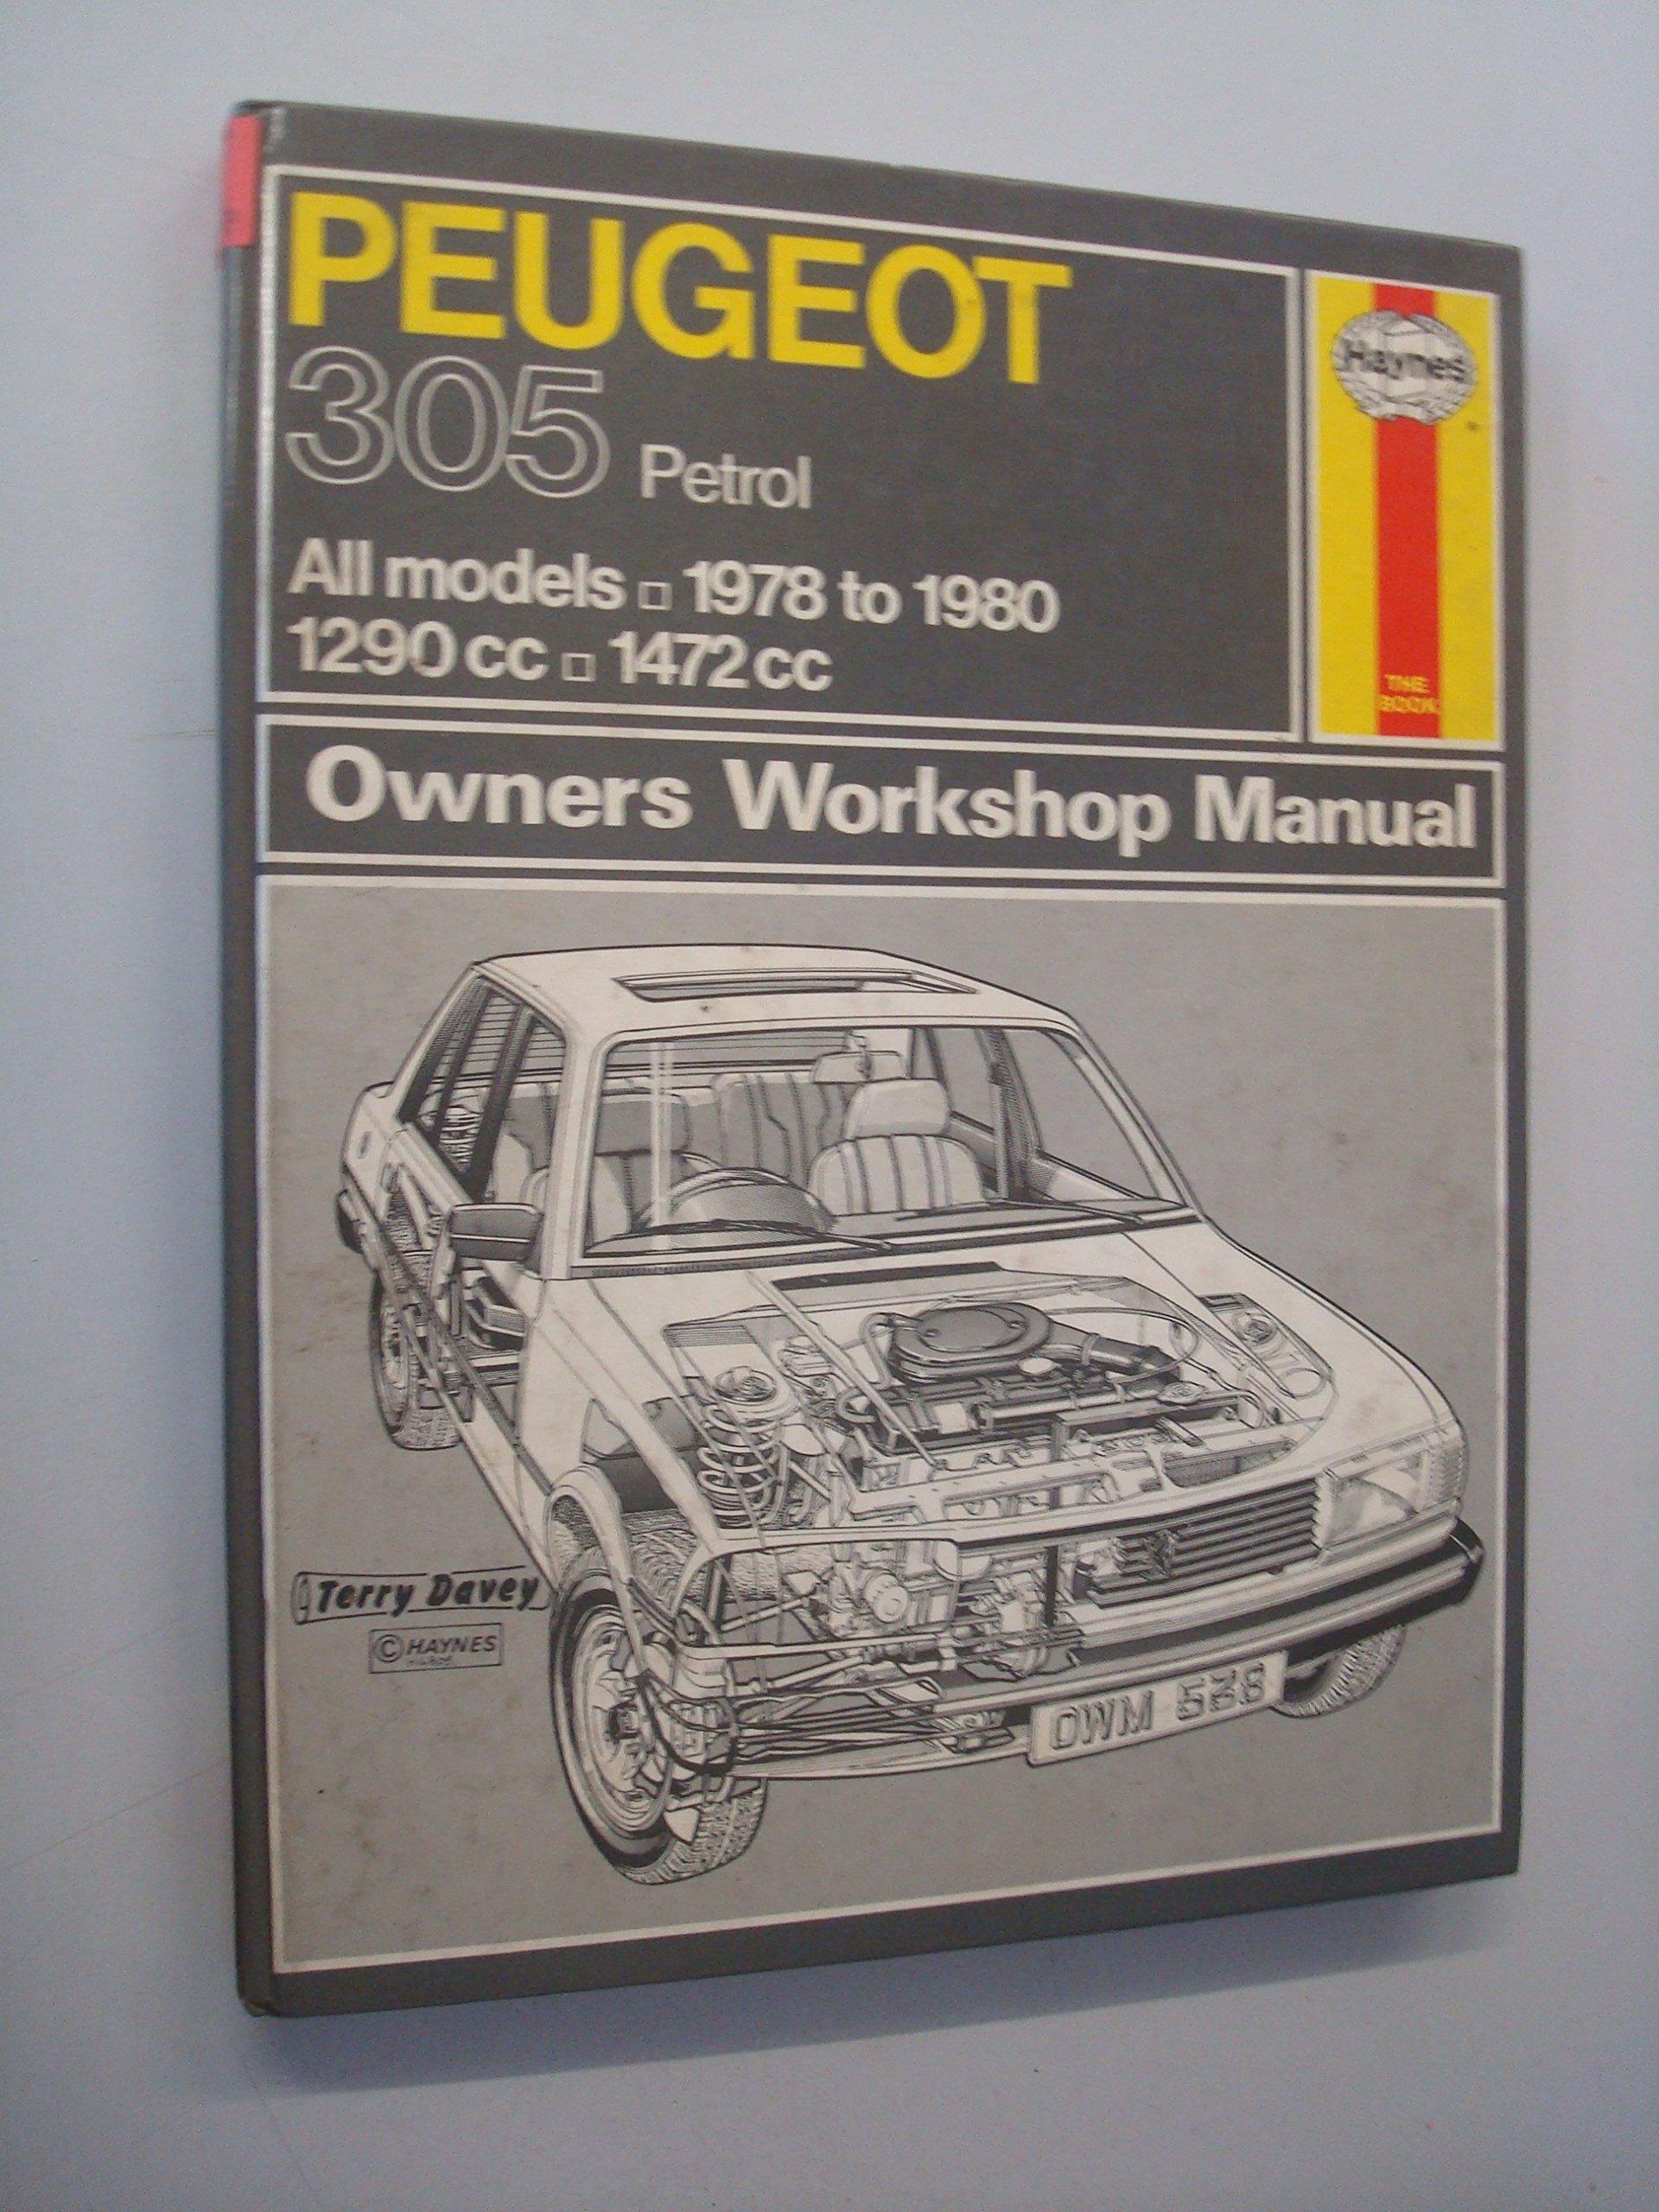 Peugeot 305 Owners Workshop Manual Hardcover – January, 1981